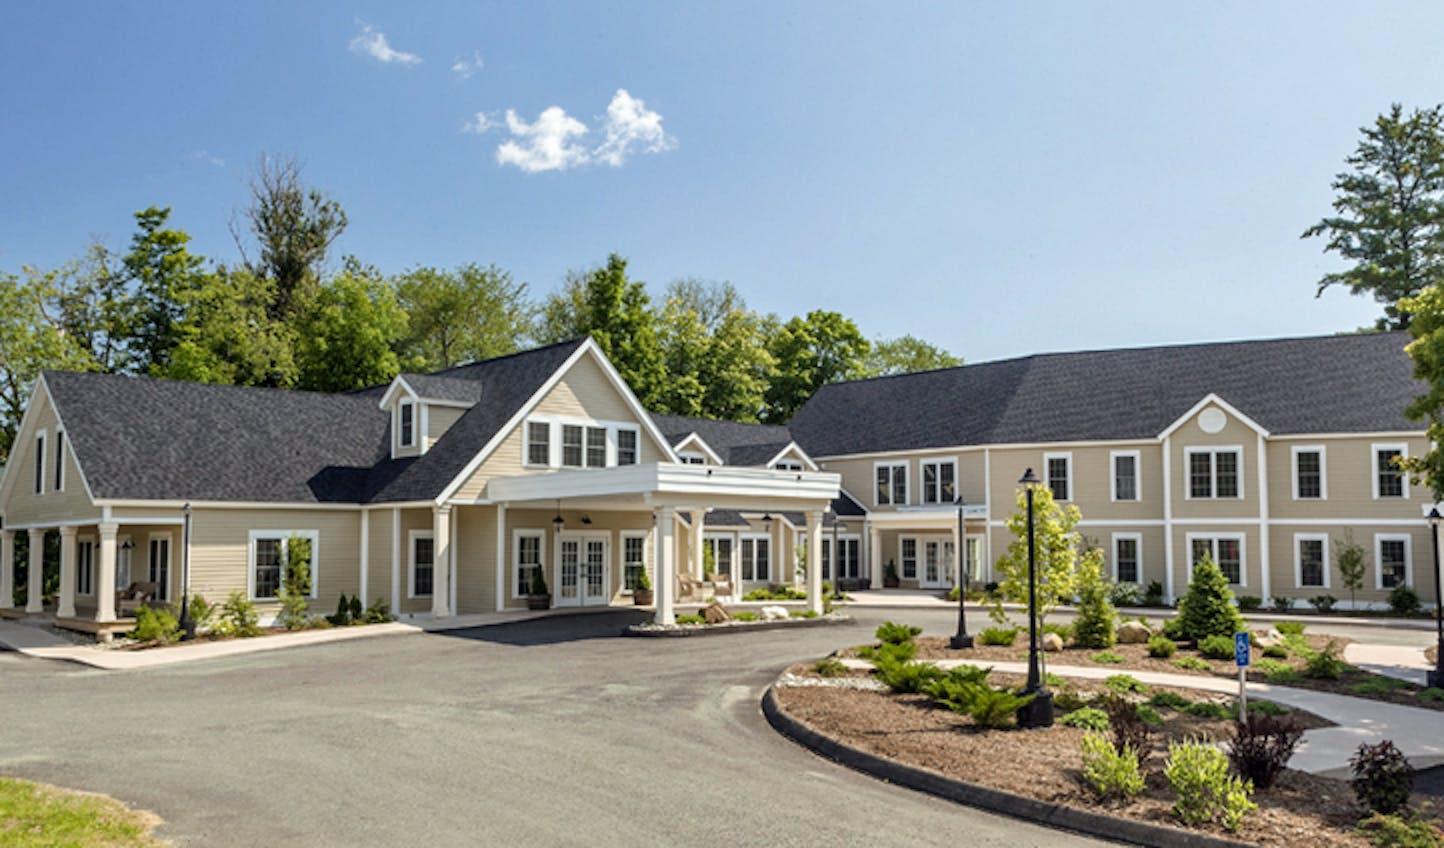 Vermont Hotels, USA